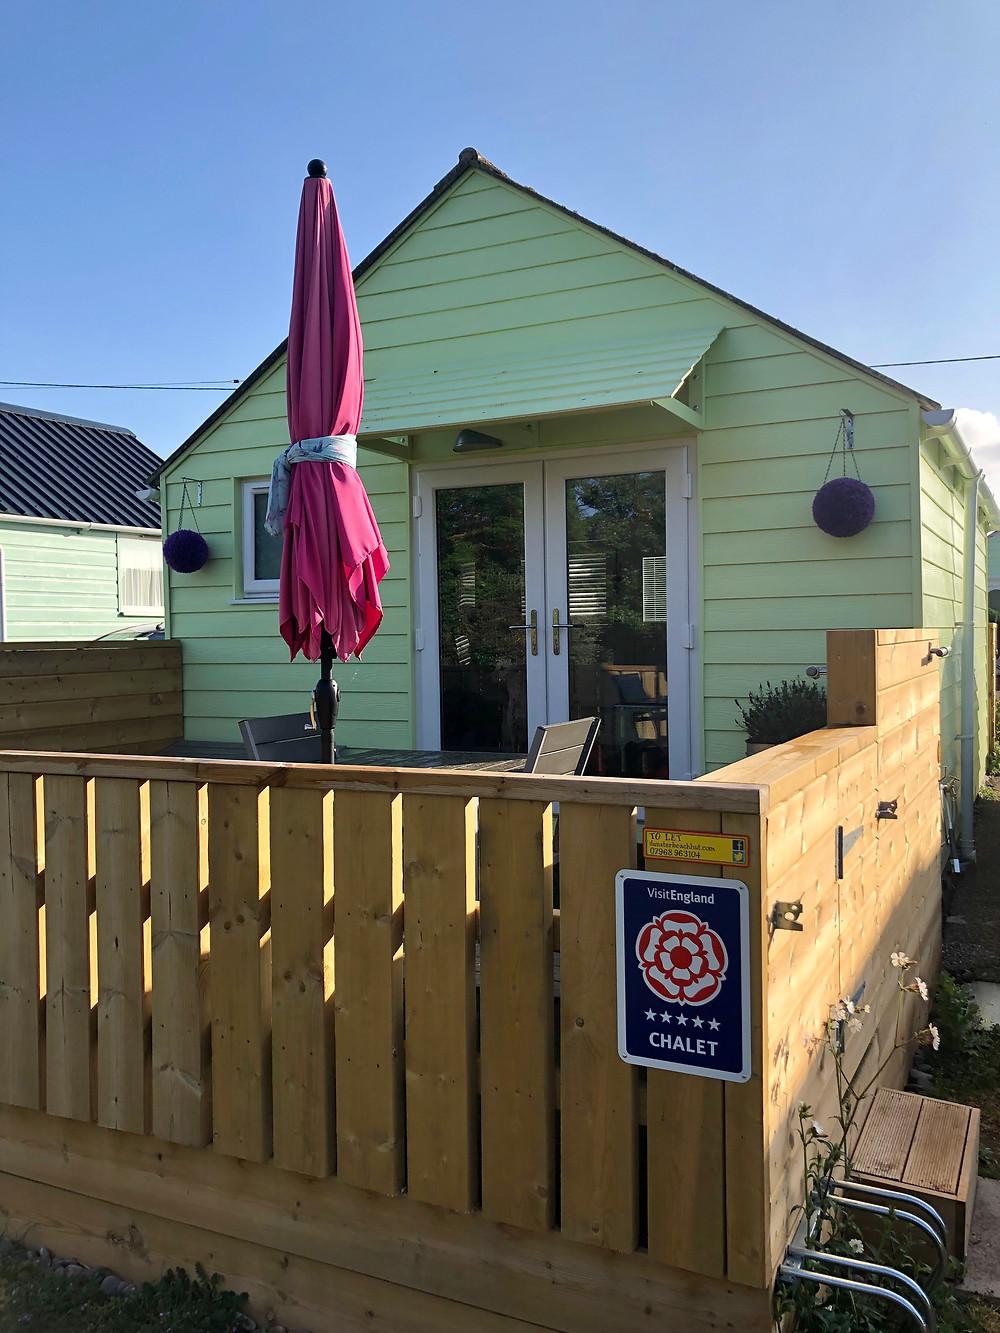 Somerset cool, Dunster beach hut holi moli, Salad days dunster beach, Somerset blogger